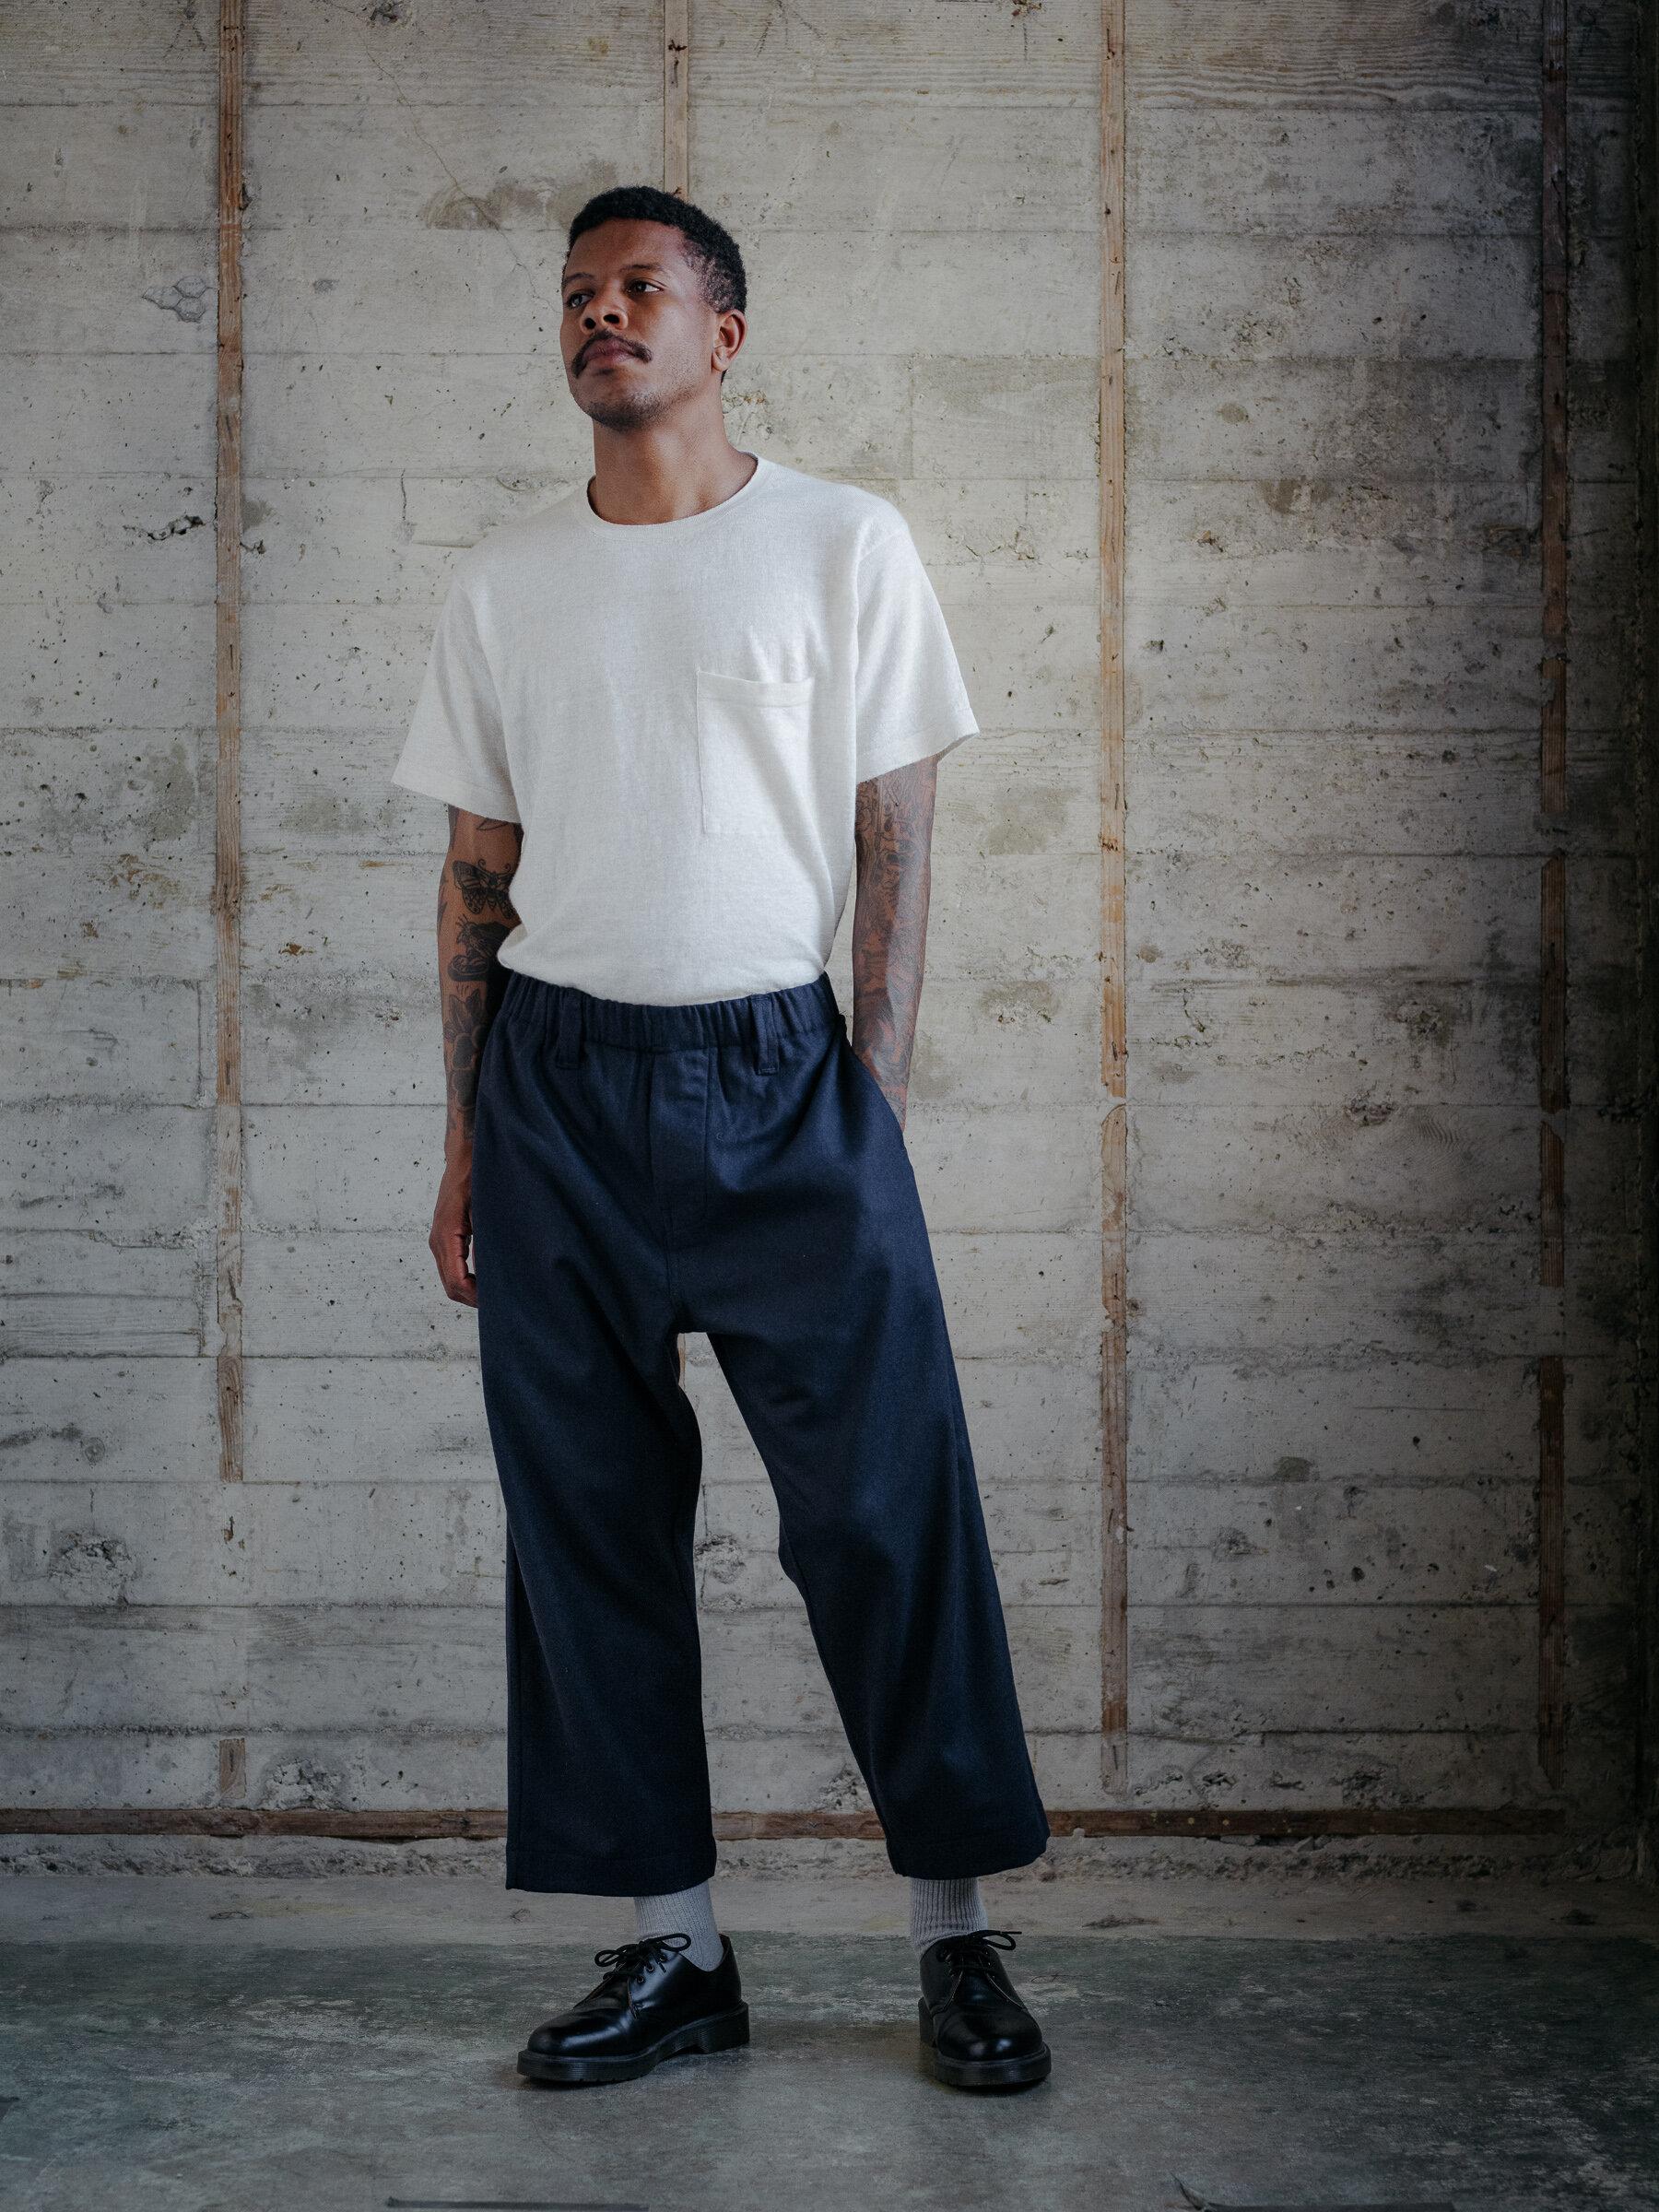 evan-kinori-elastic-pant-cashmere-lambswool-woven-in-england-made-in-san-francisco-5